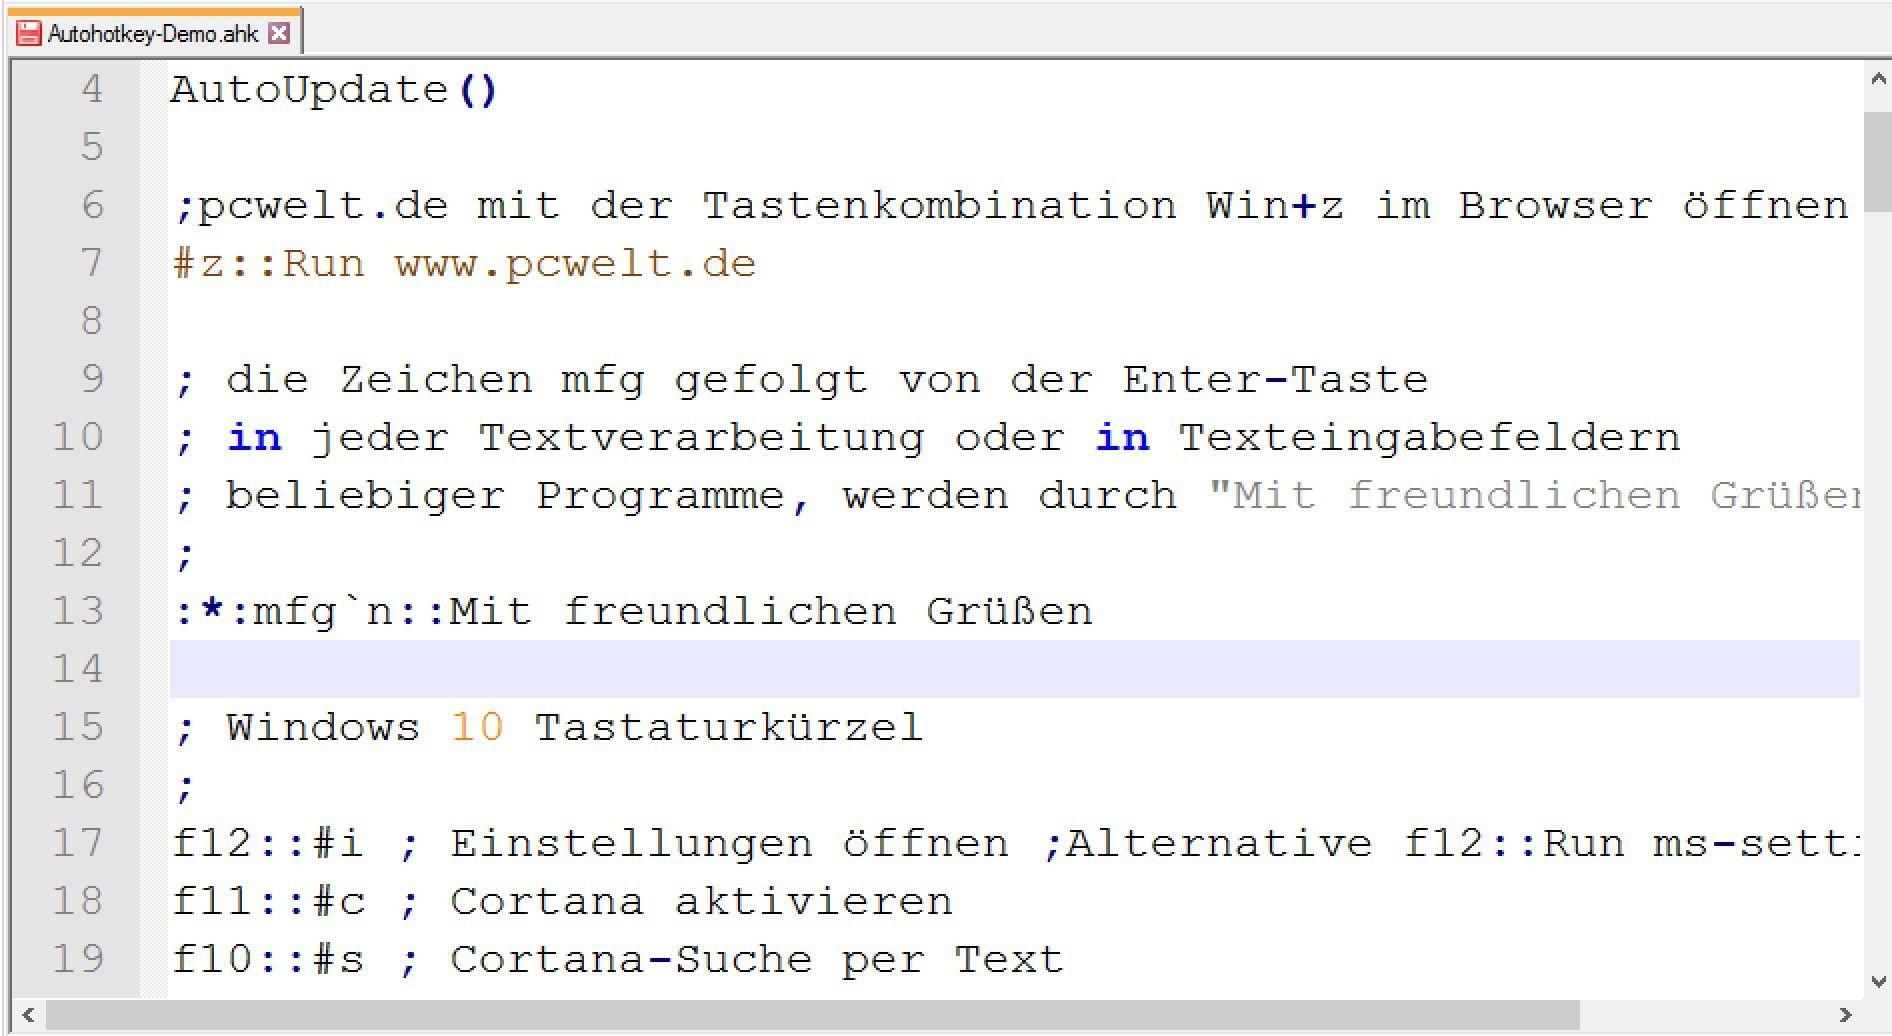 Hotkeys & Makros: Windows 10 effizienter bedienen - PC-WELT